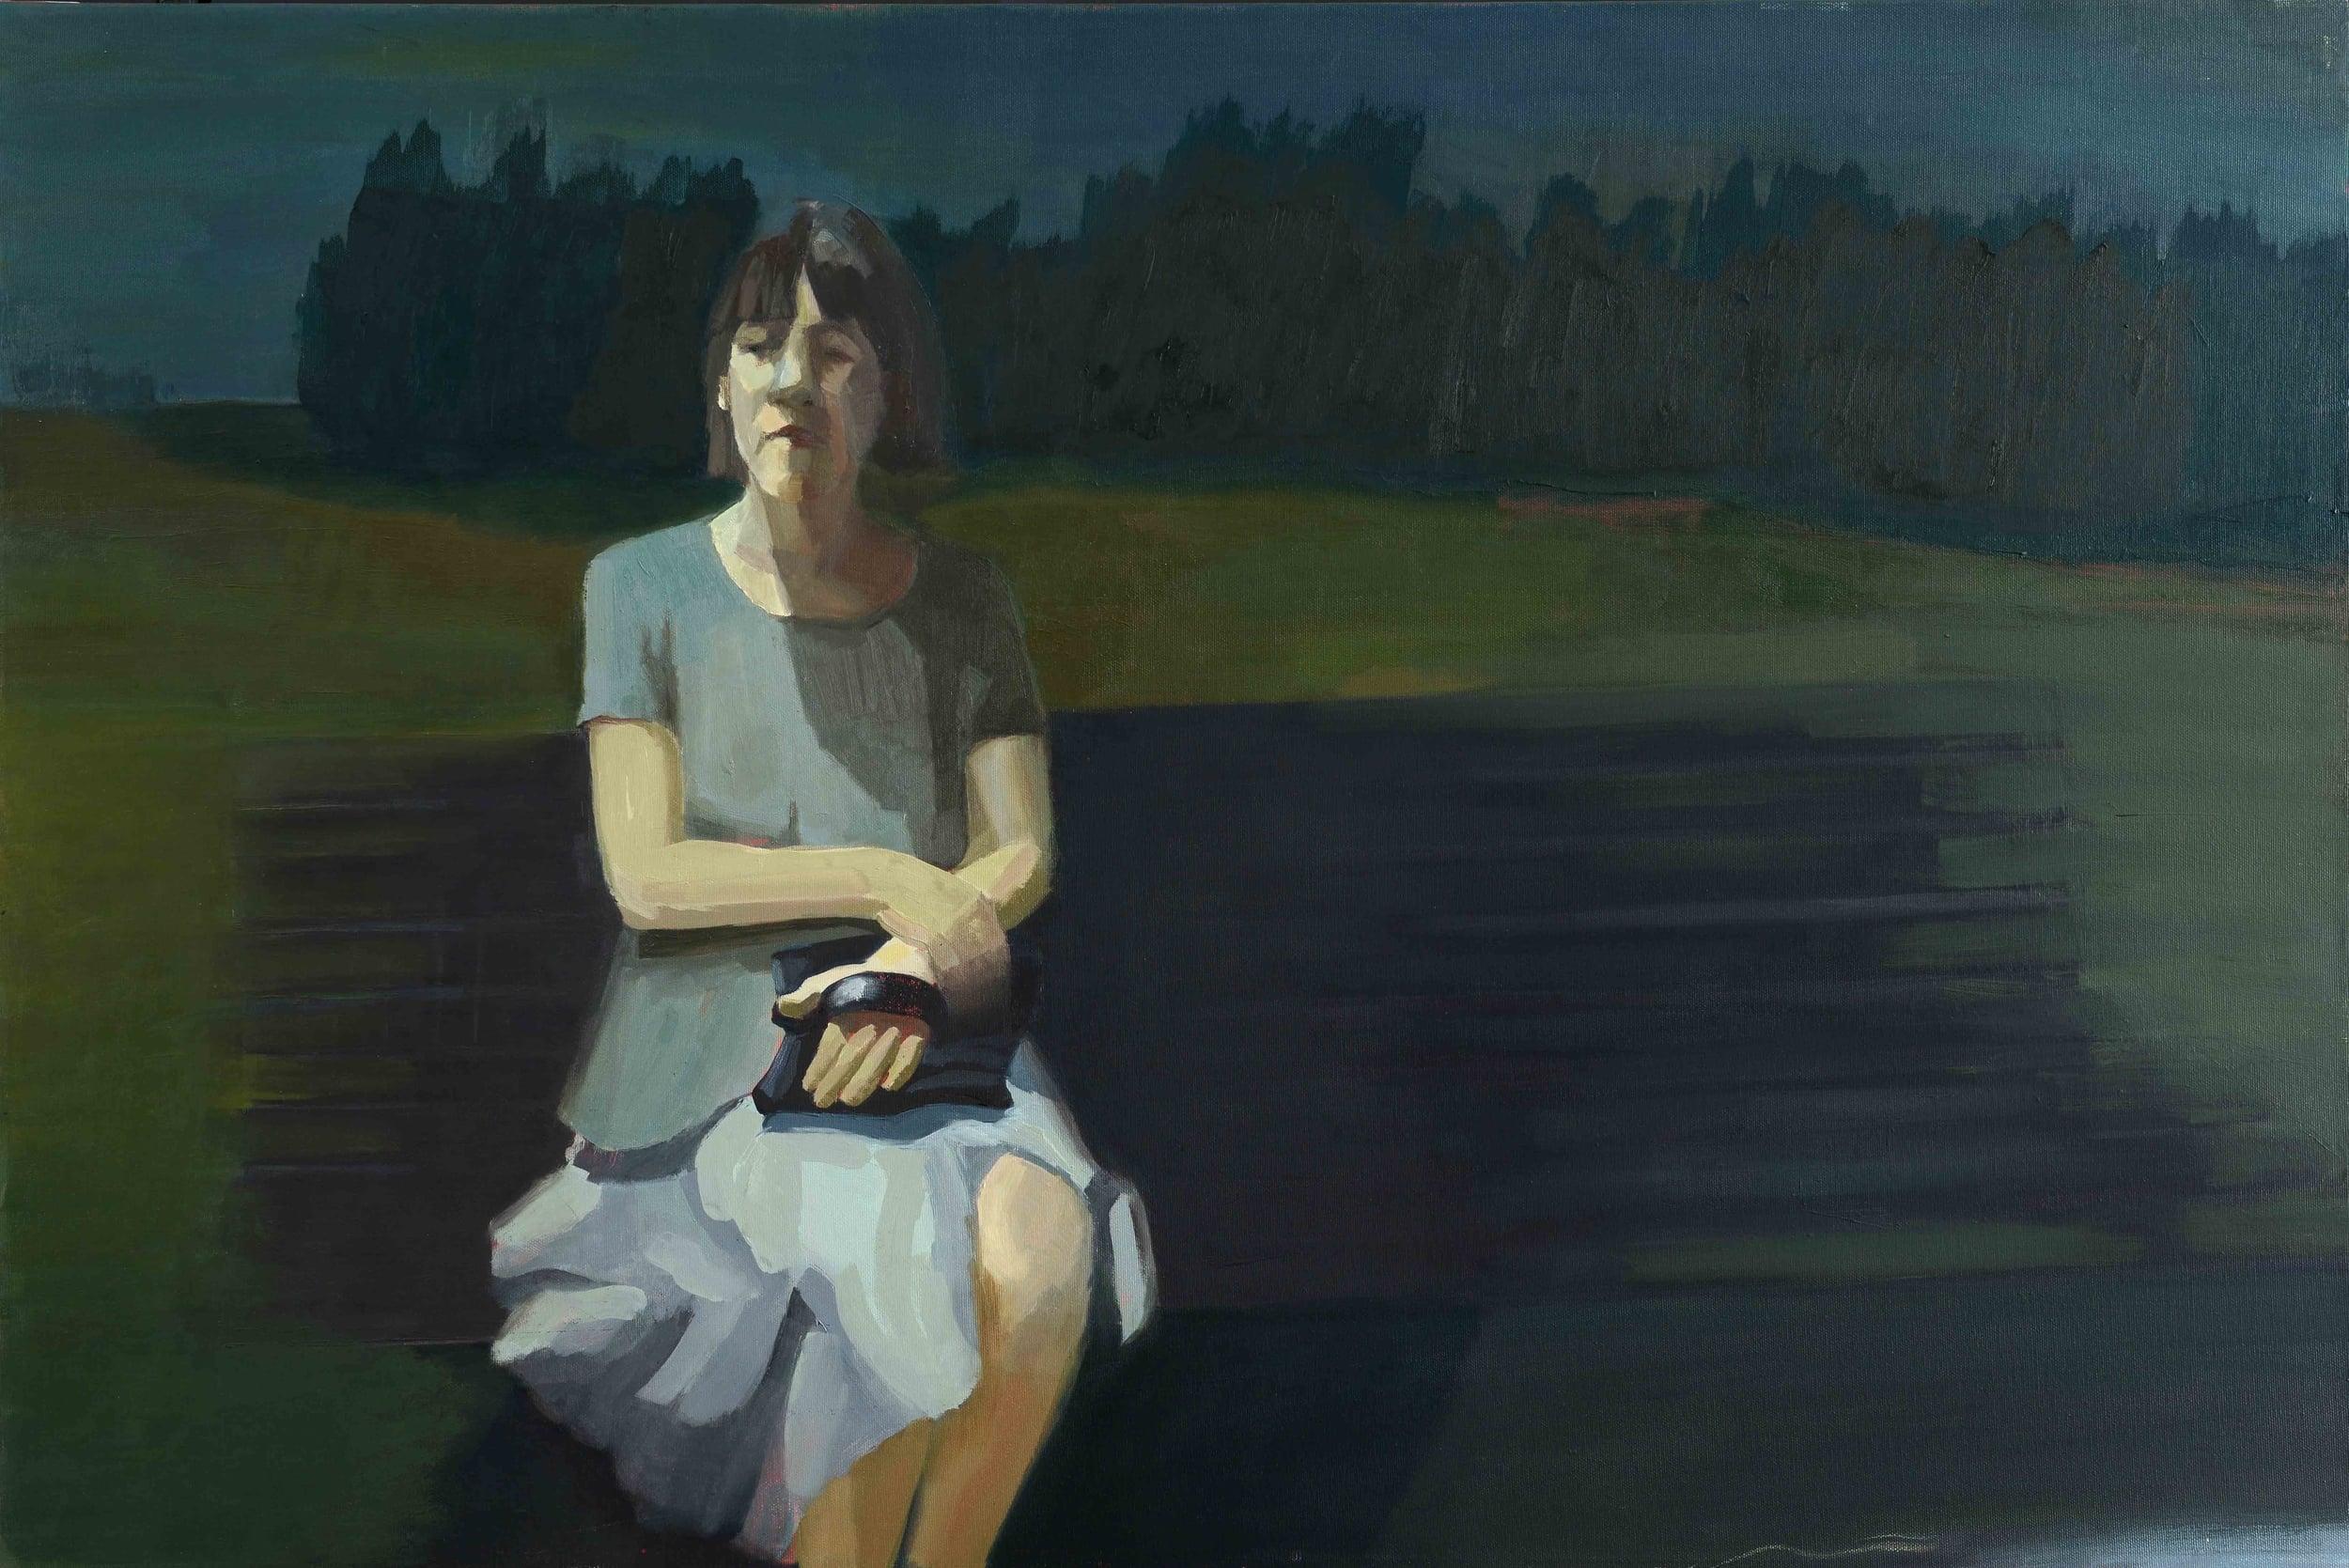 Michal Lewit at Artspace